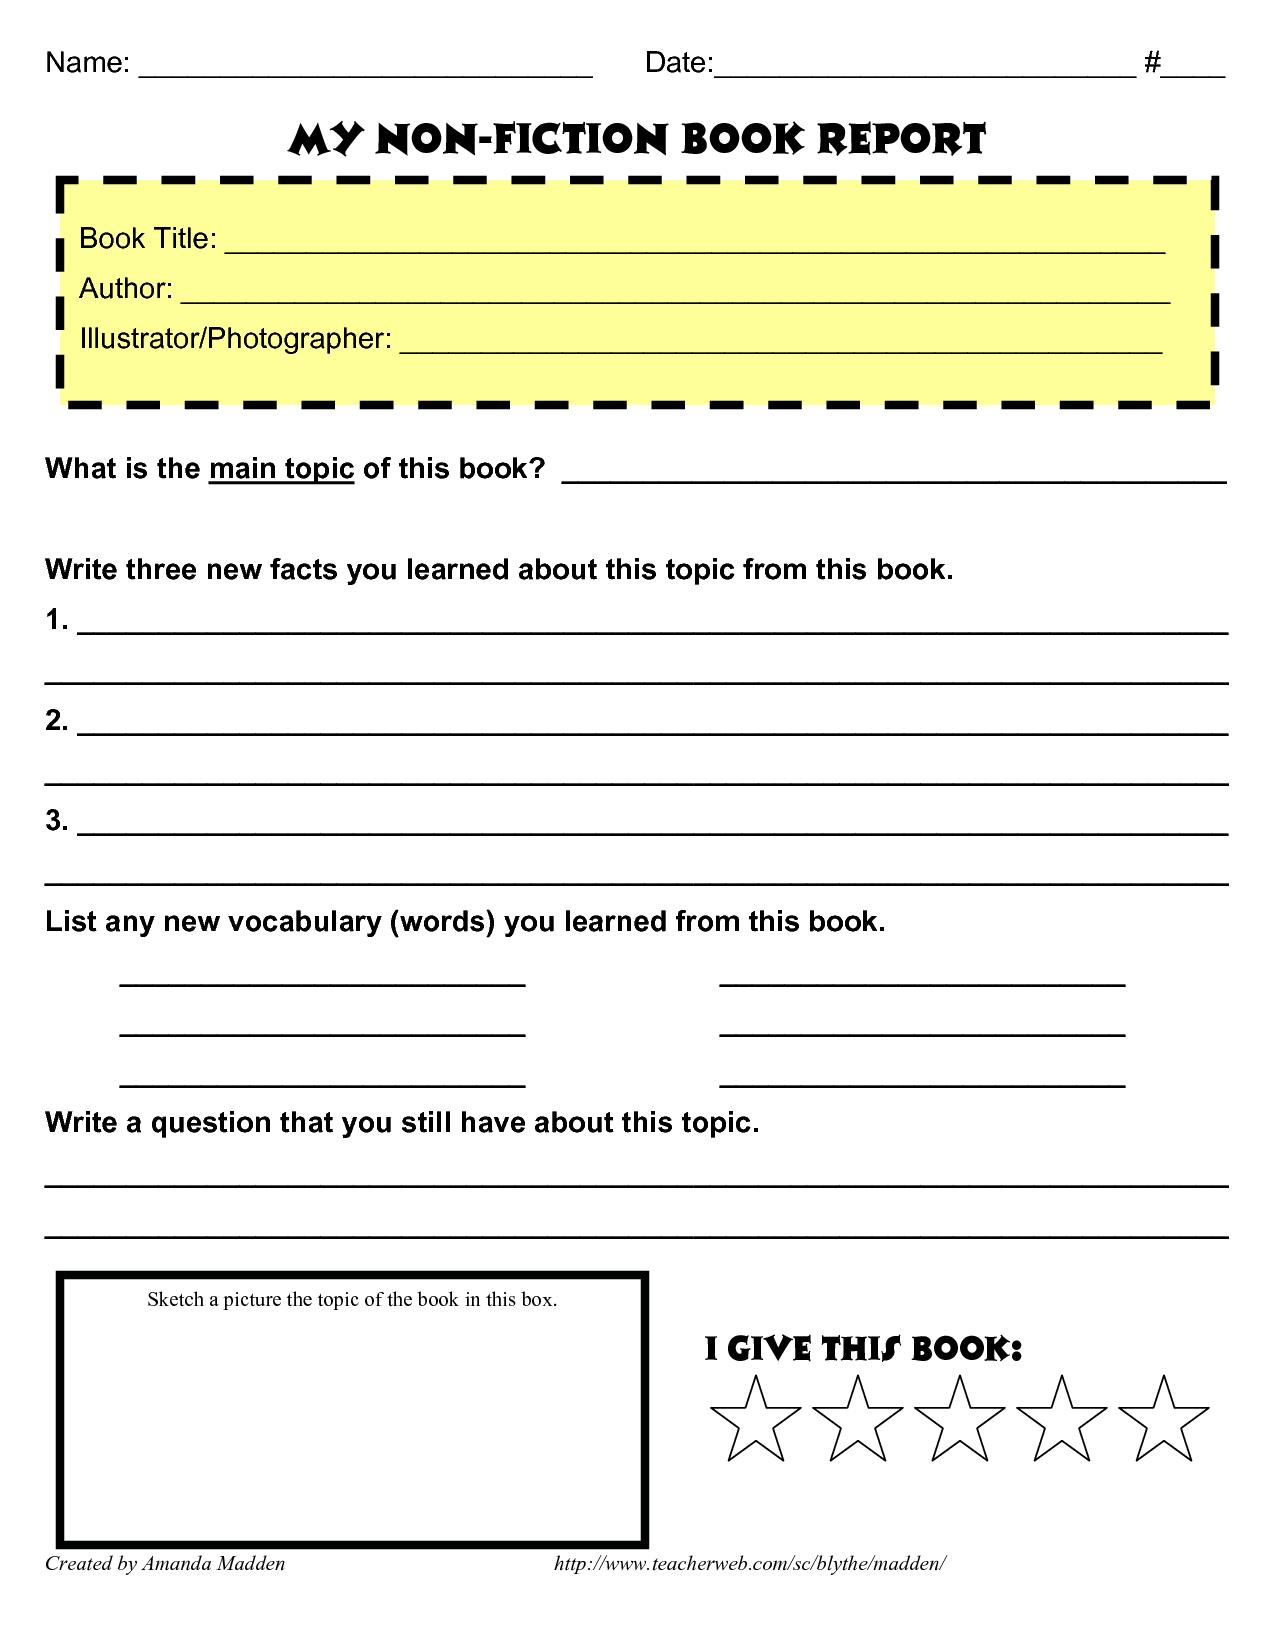 grade 4 book report template non fiction   Book report template middle  school [ 1650 x 1275 Pixel ]